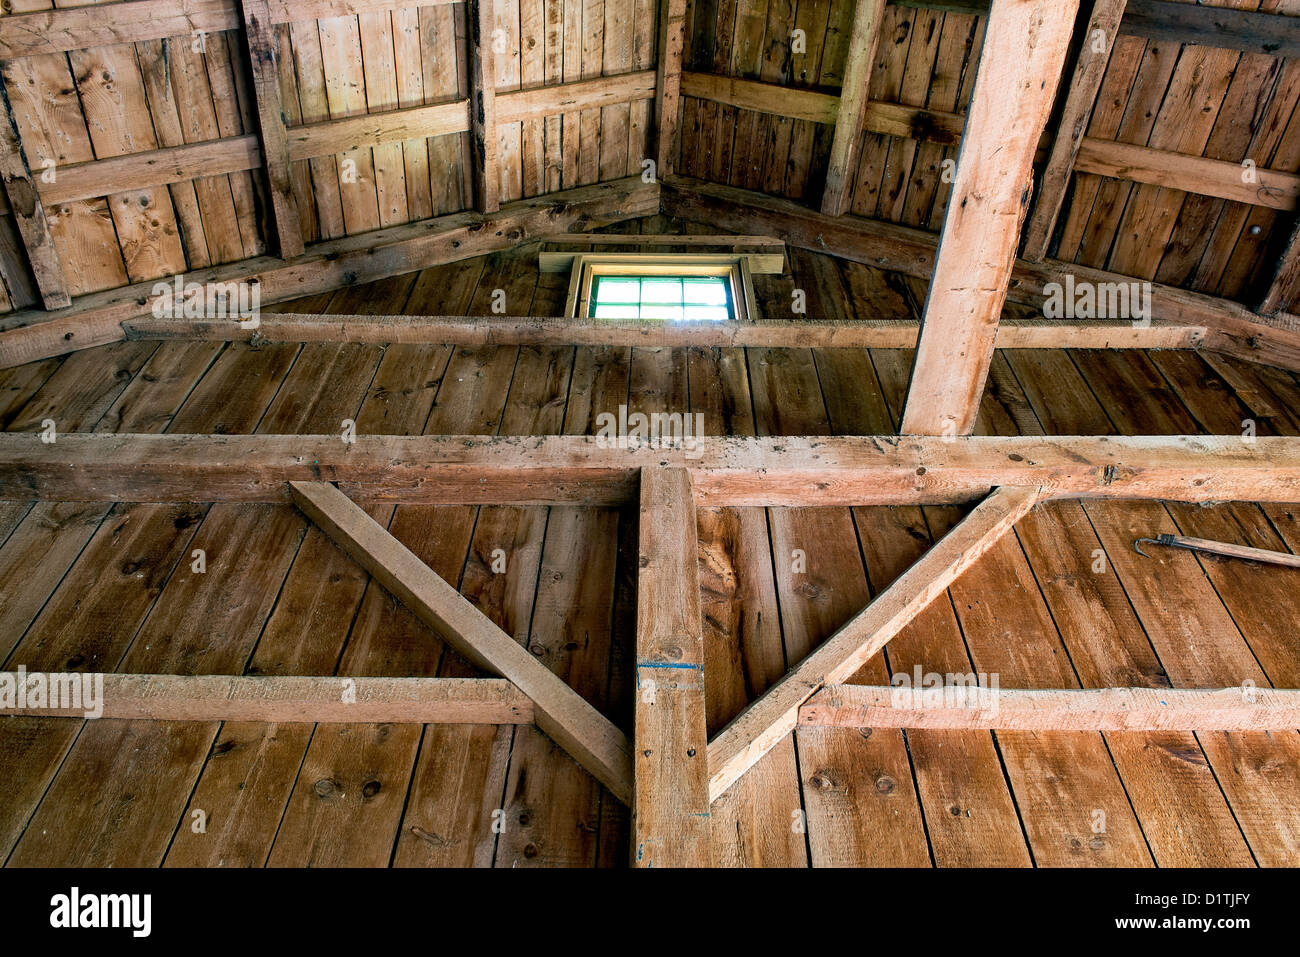 Interior of a barn. - Stock Image